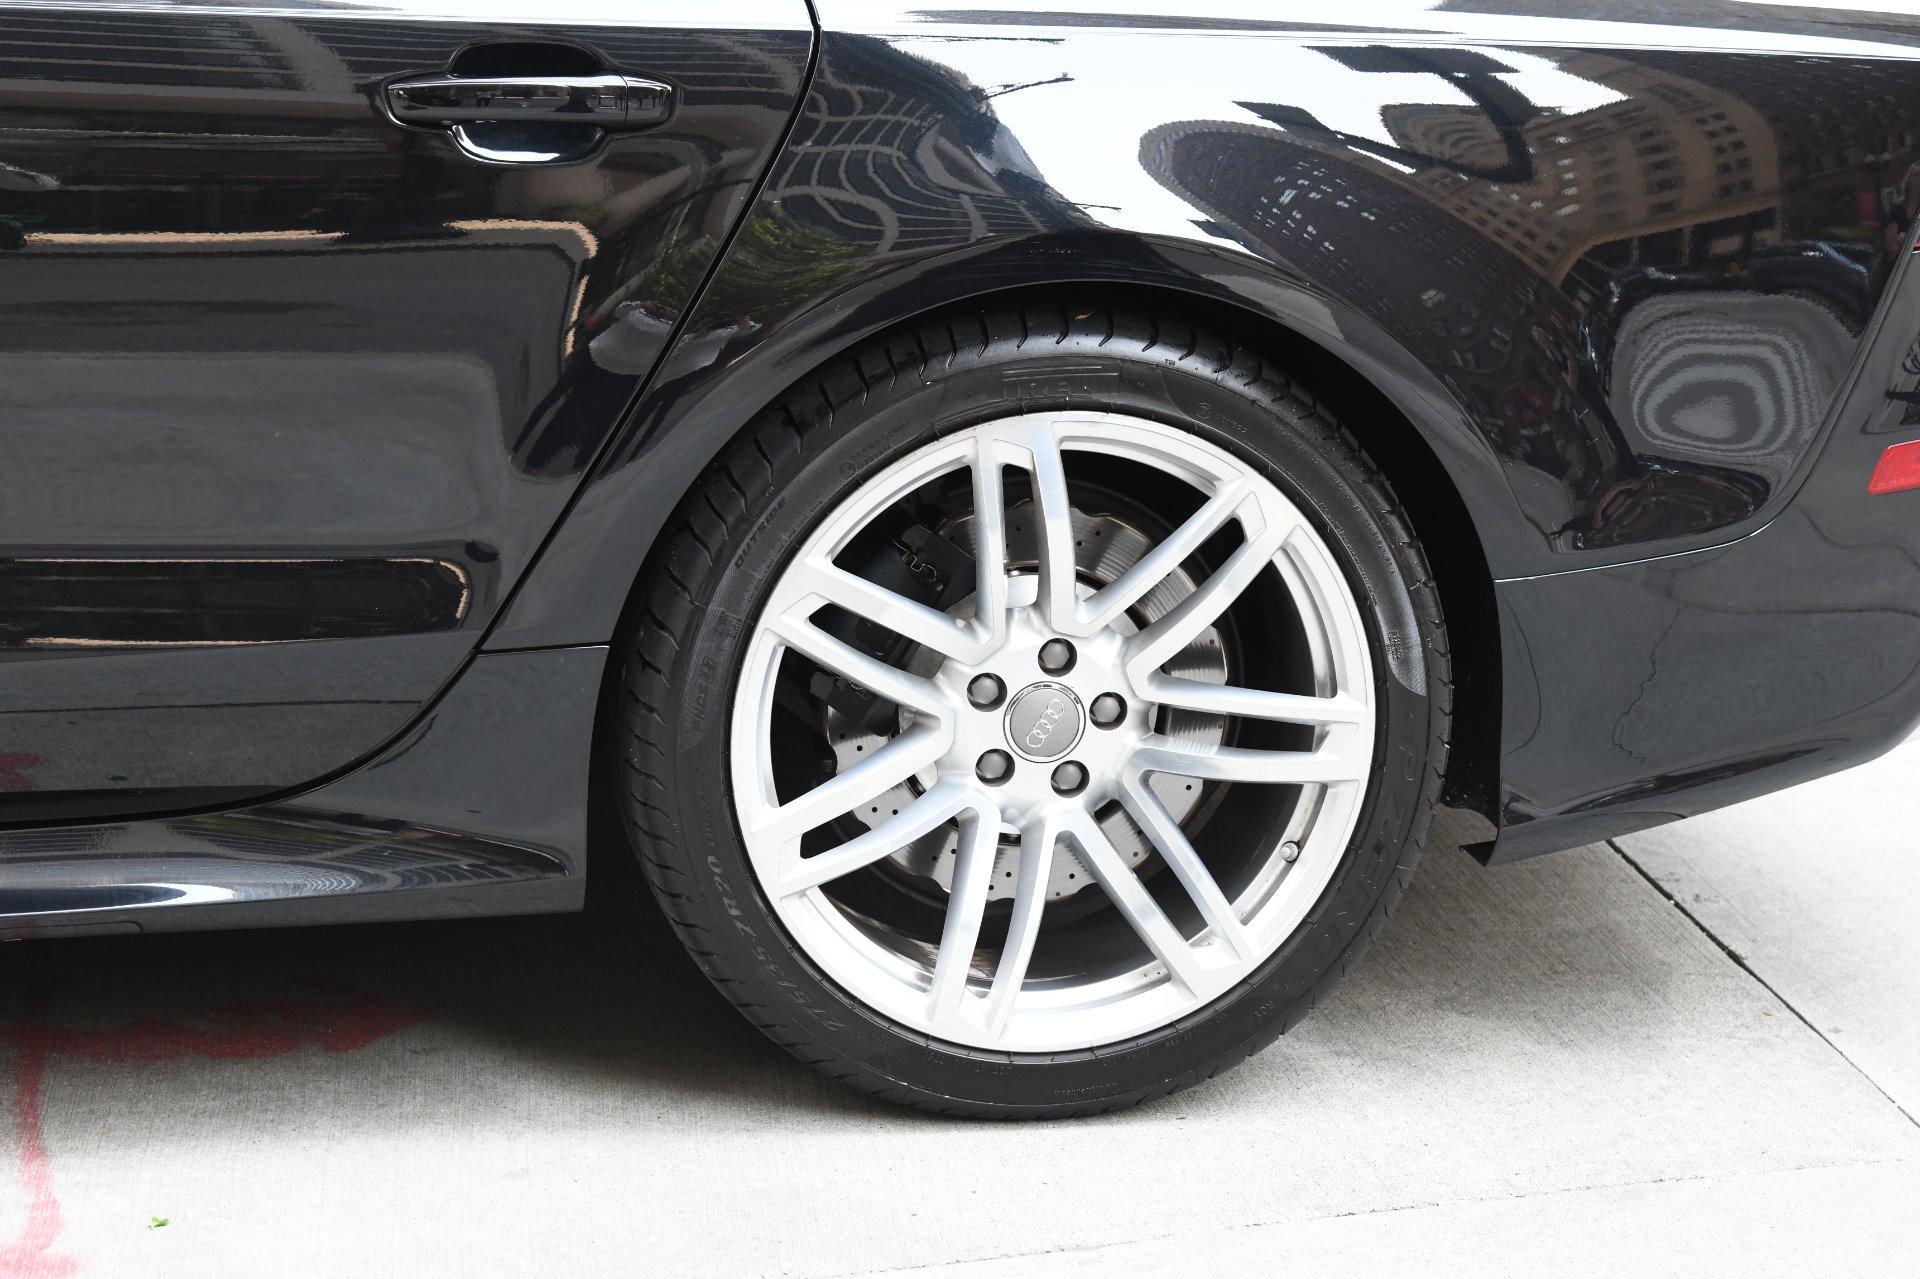 Used 2015 Audi RS 7 Prestige Quattro Original Msrp $118,075 | Chicago, IL